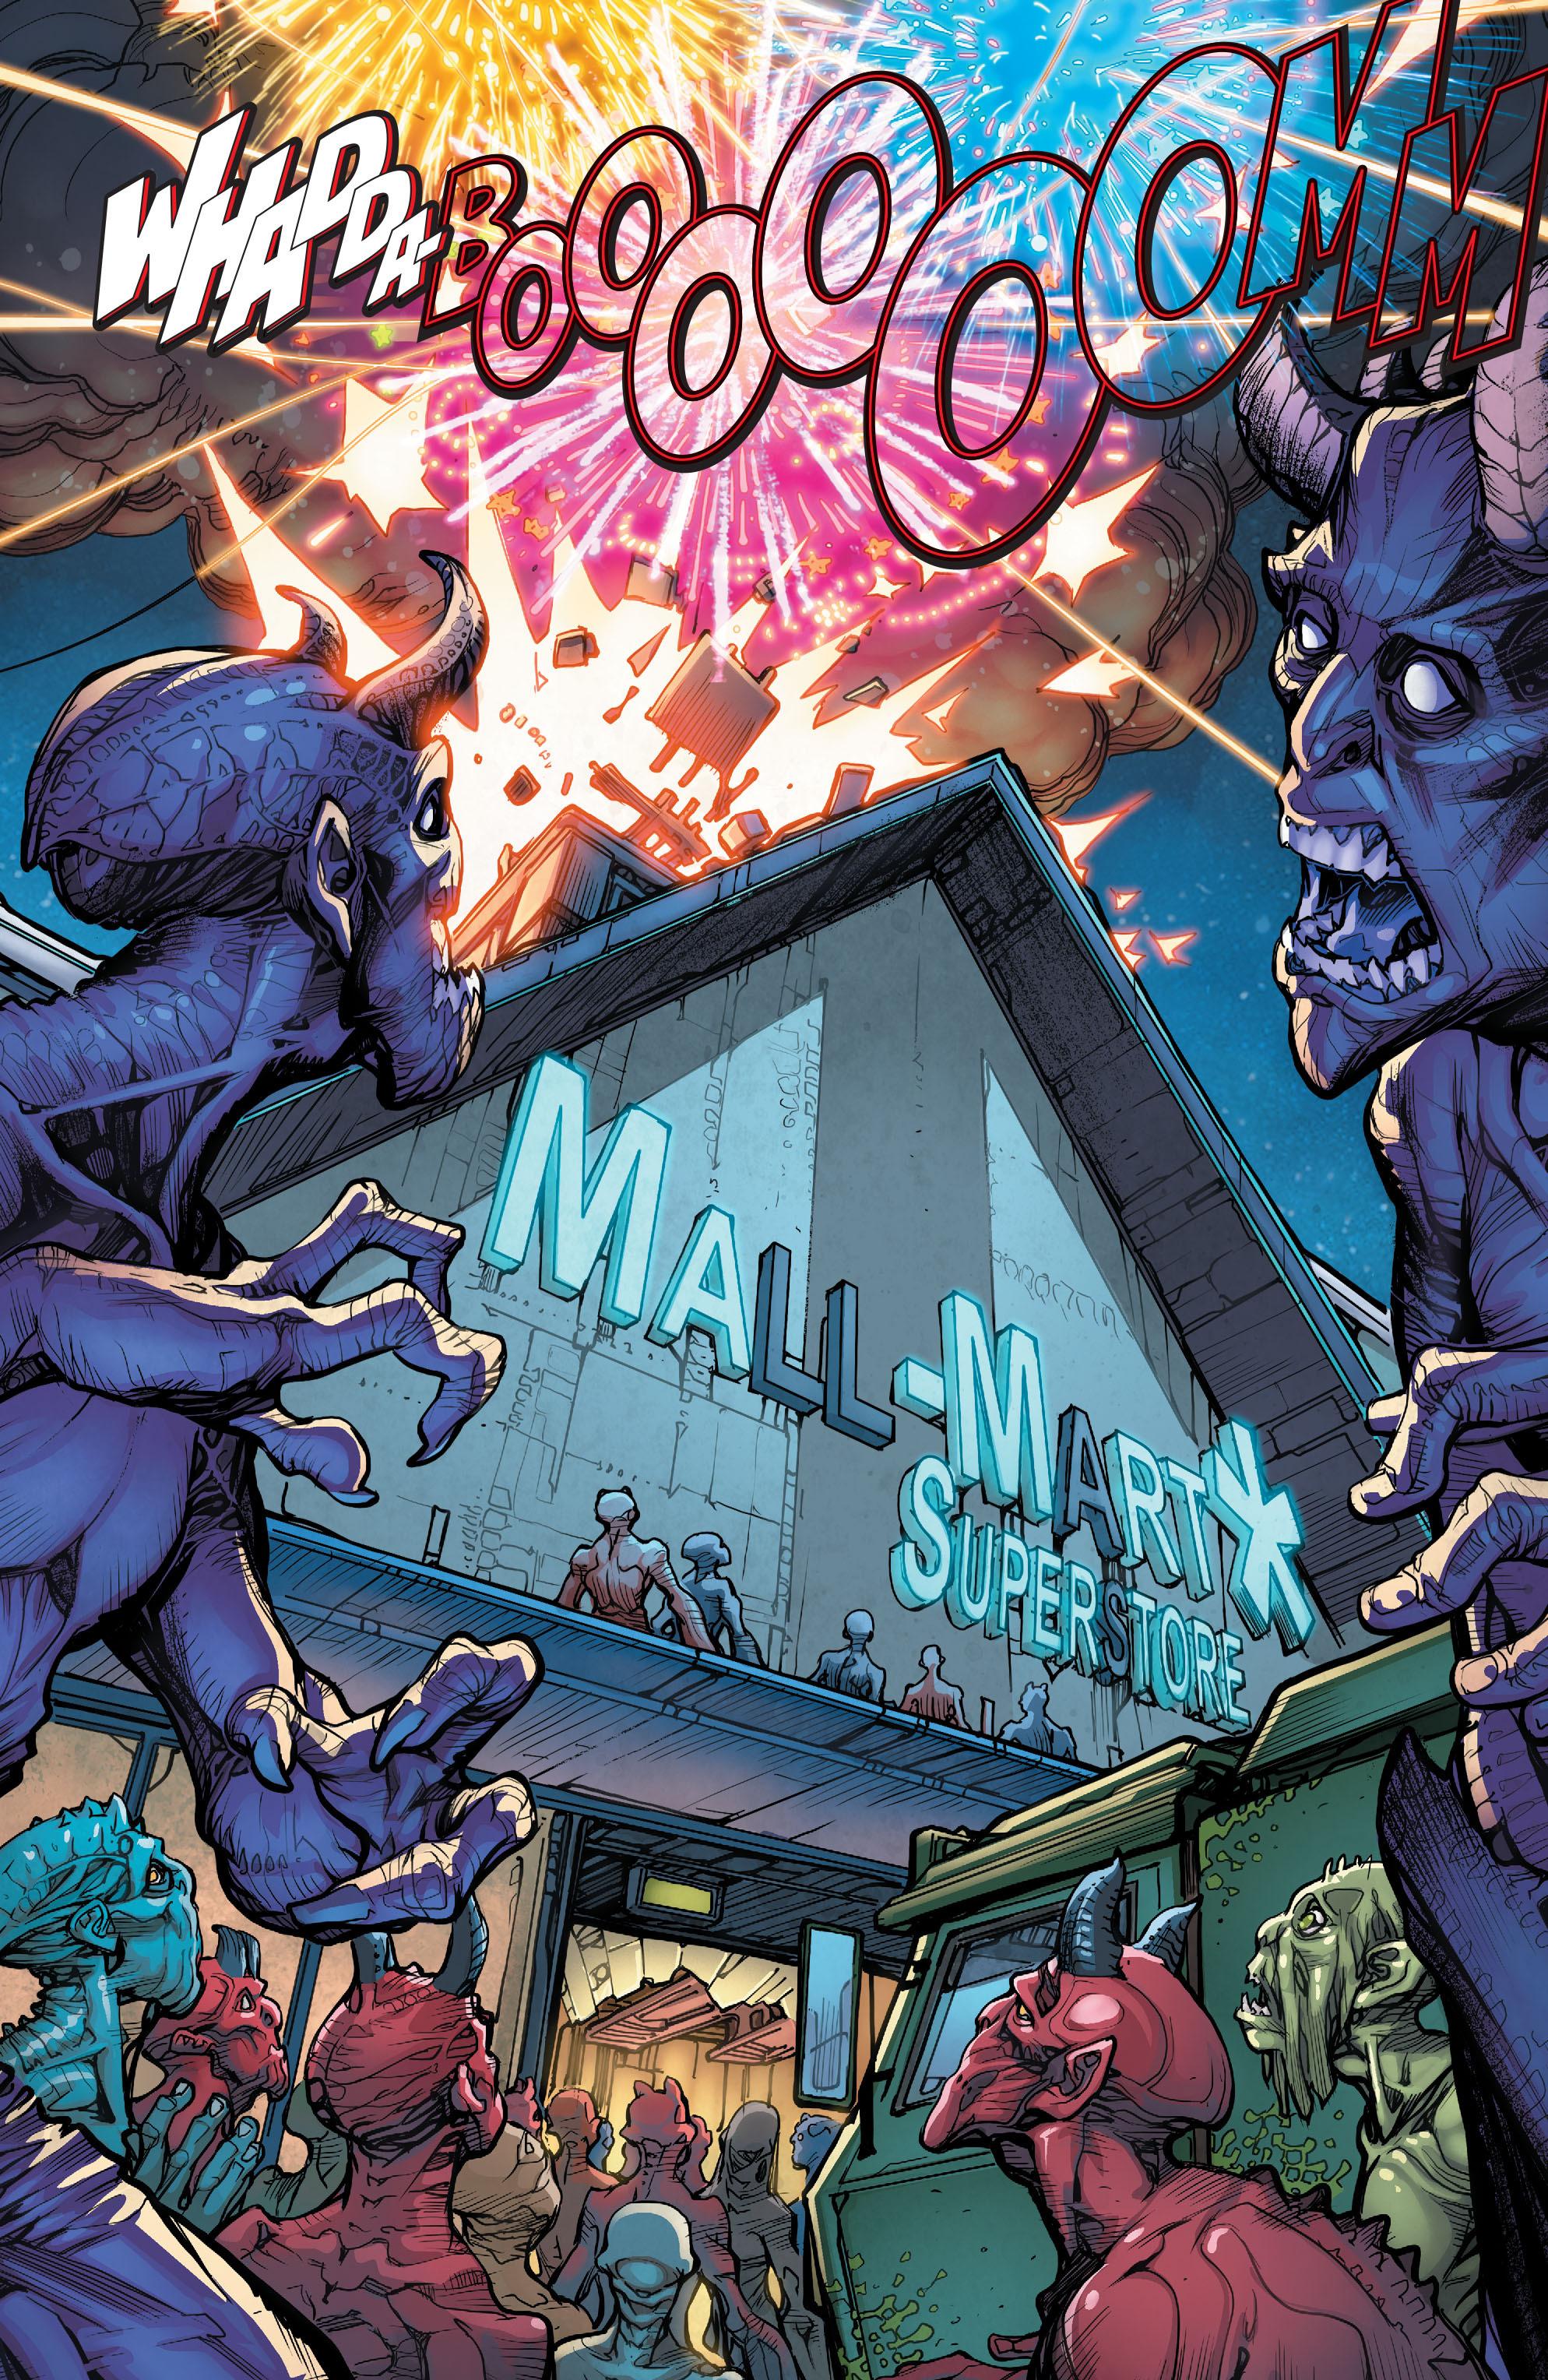 Read online Scooby Apocalypse comic -  Issue #7 - 15